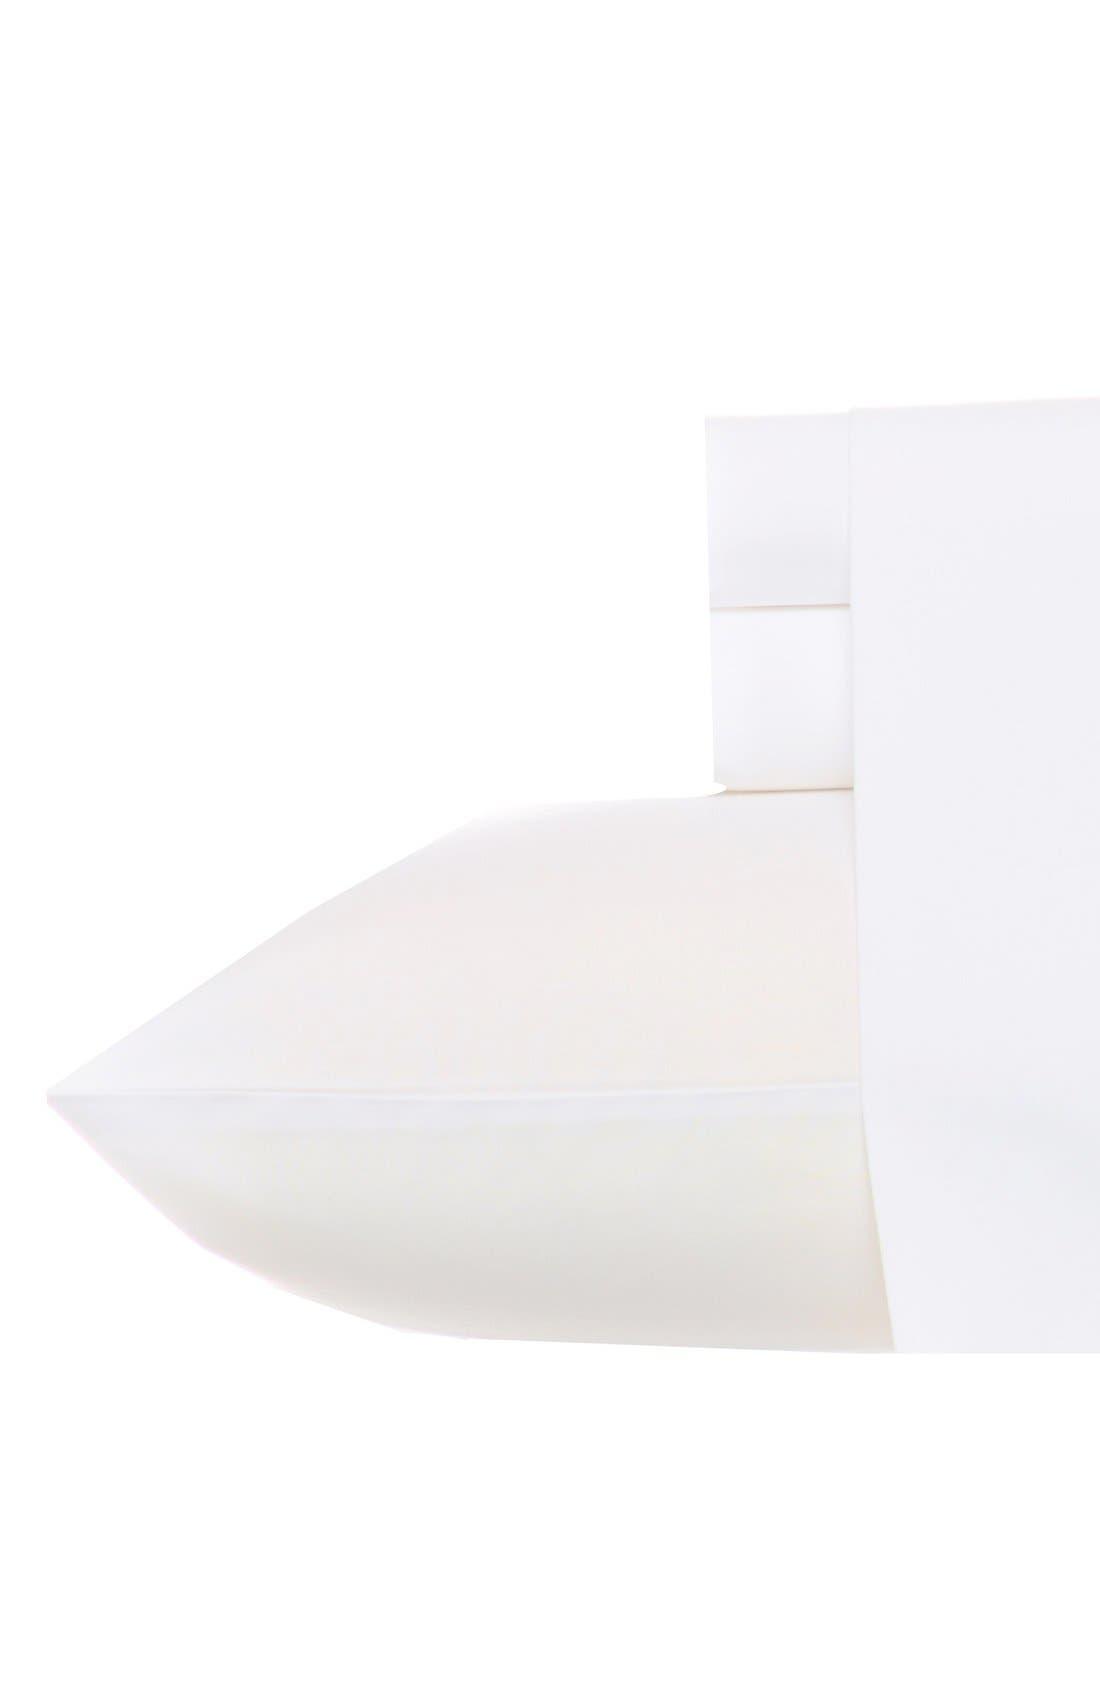 Alternate Image 1 Selected - Nautica Cotton Sheet Set